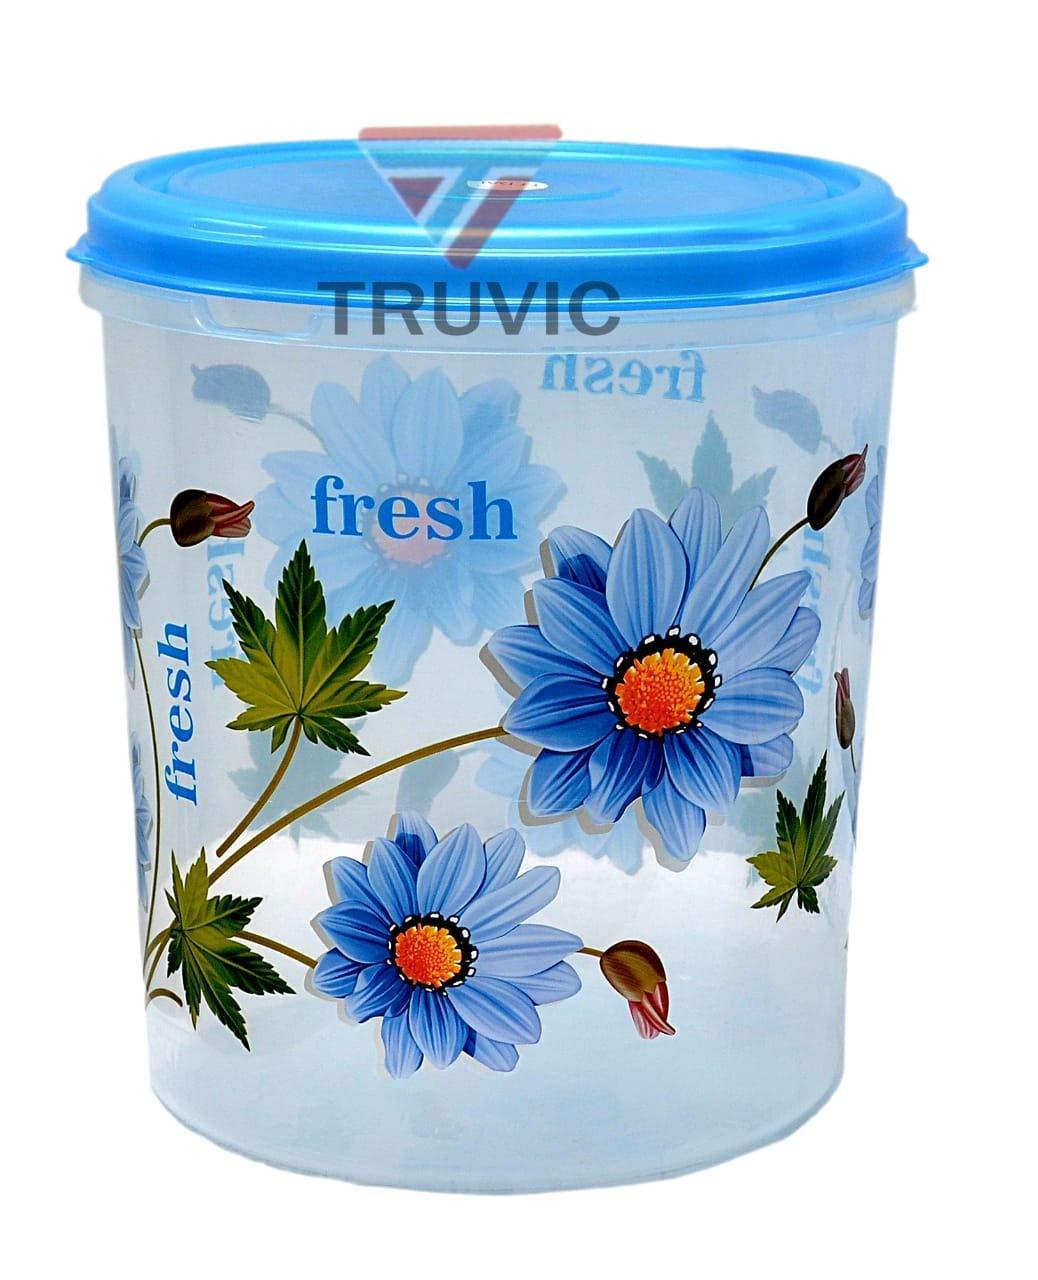 Truvic Plastic Kitchen Storage Container 7Ltr